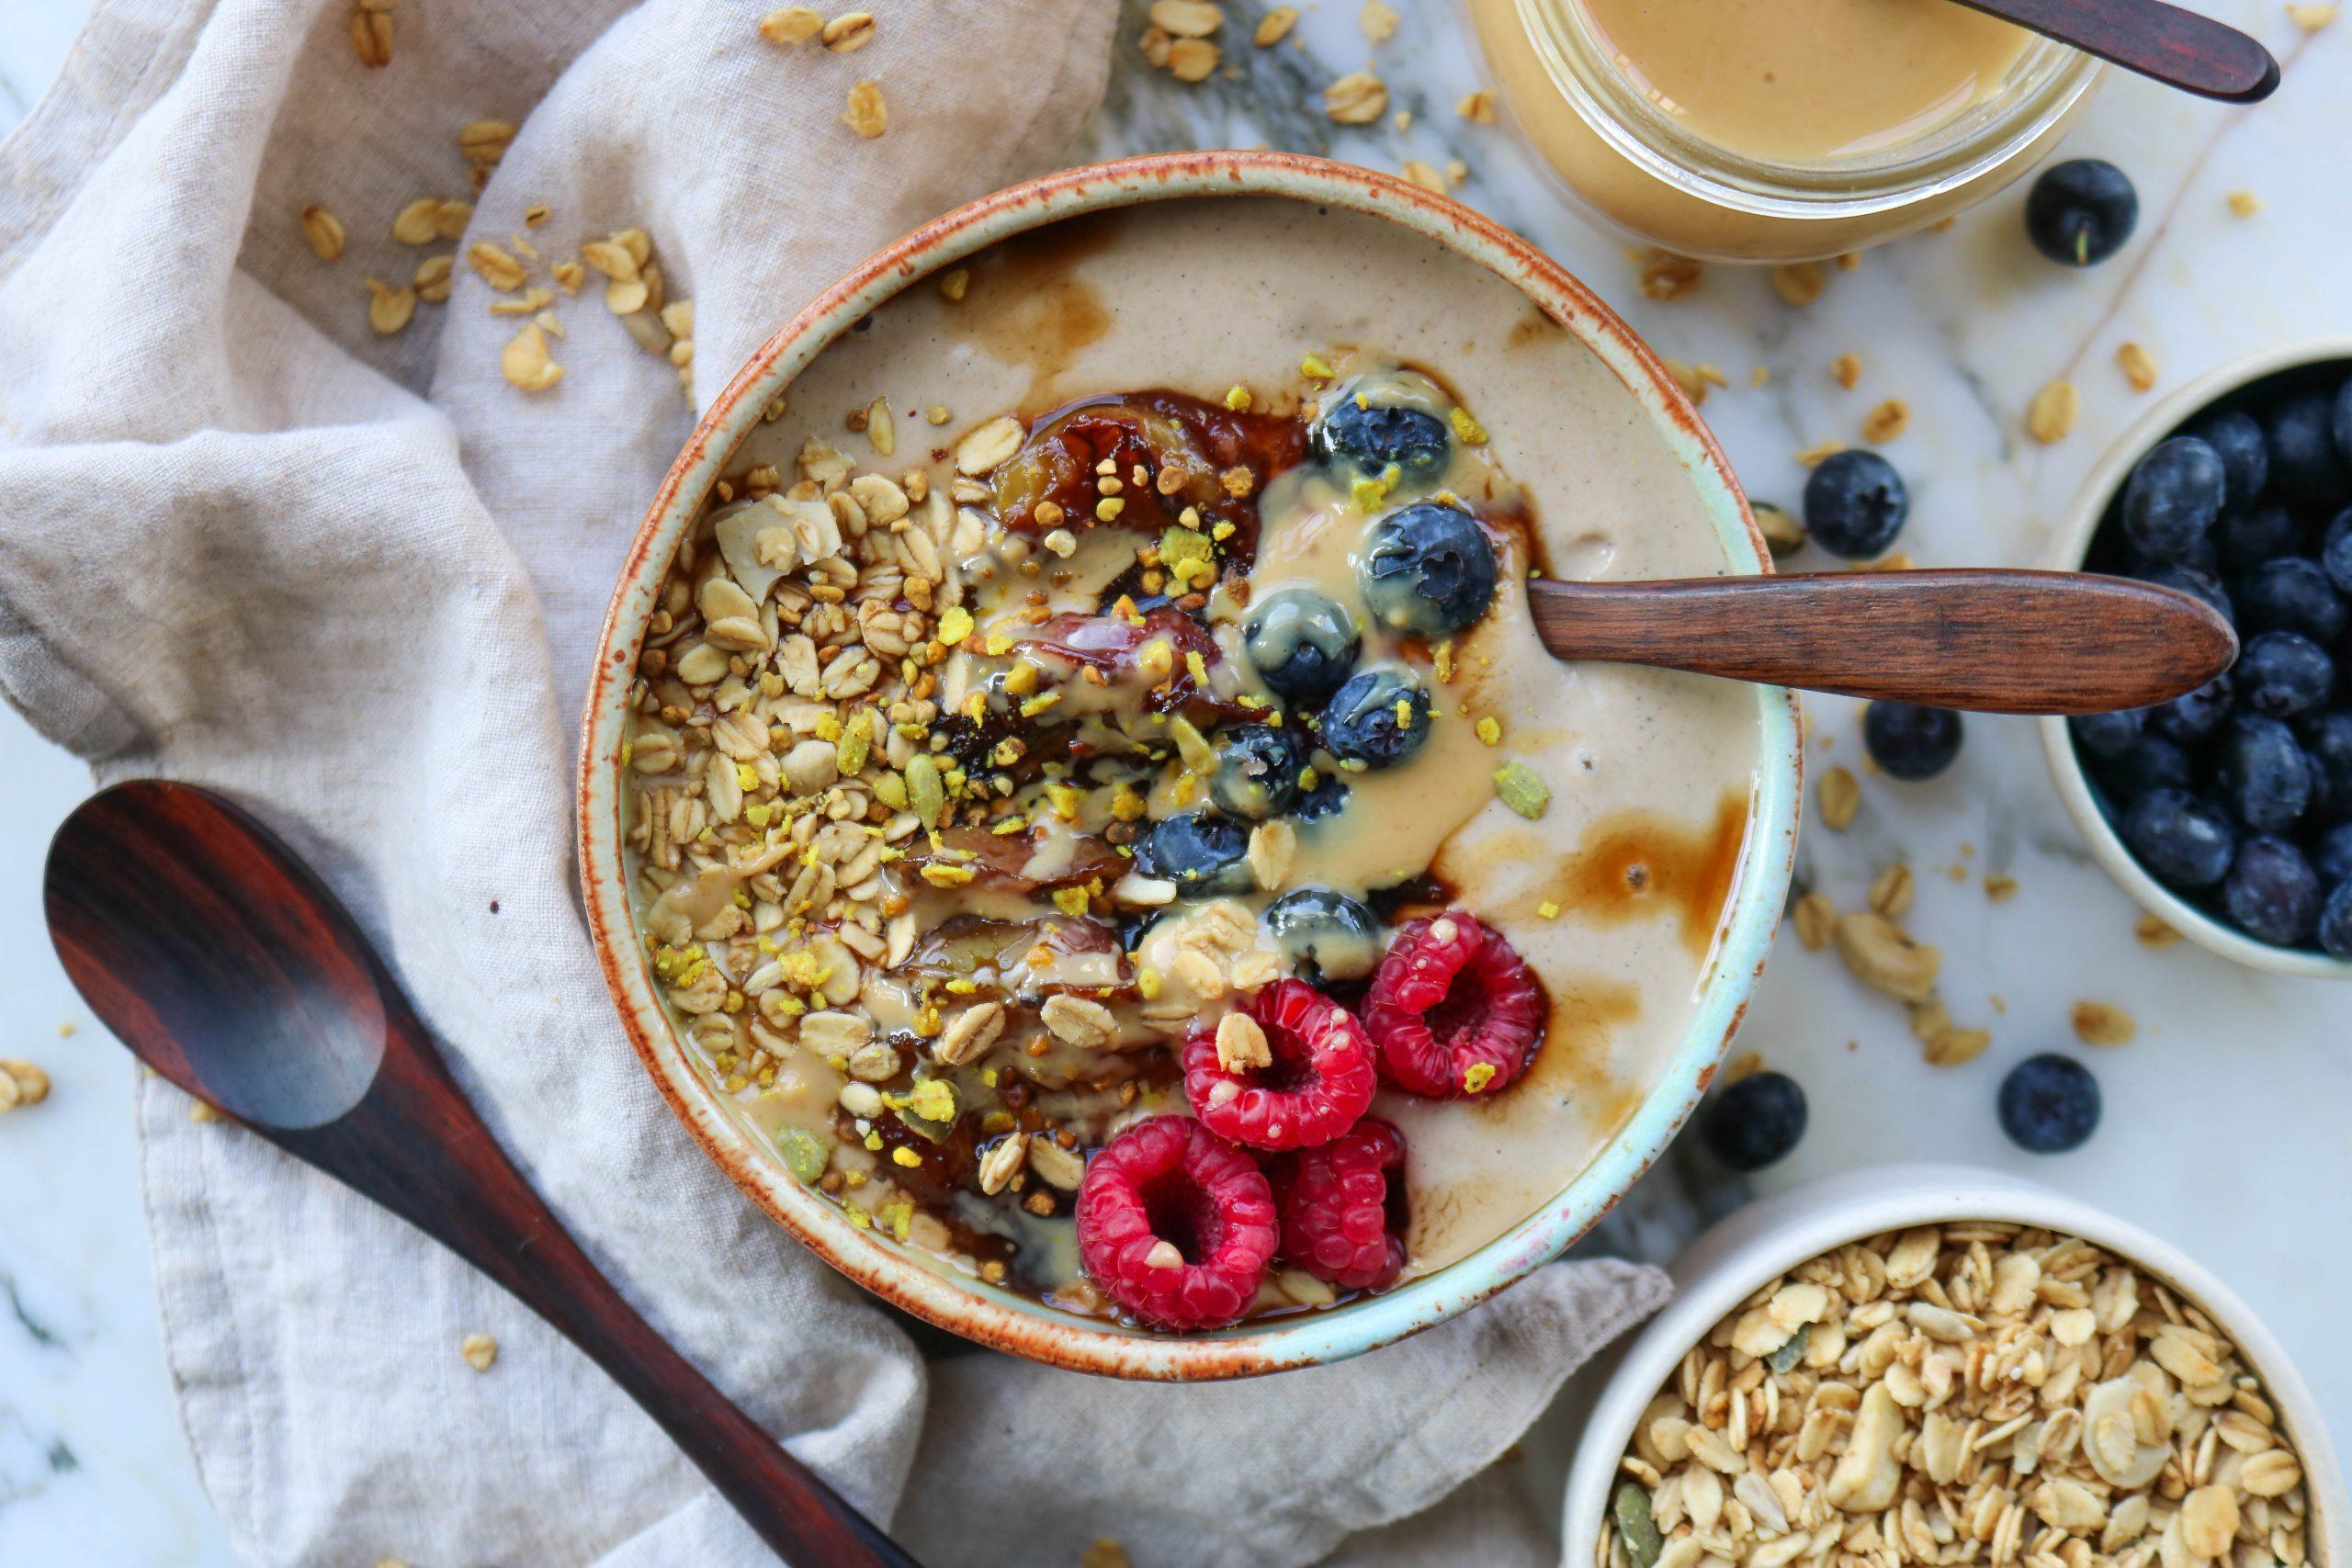 Peanut Butter & Vanilla Buckwheat porridge with Stewed Plums